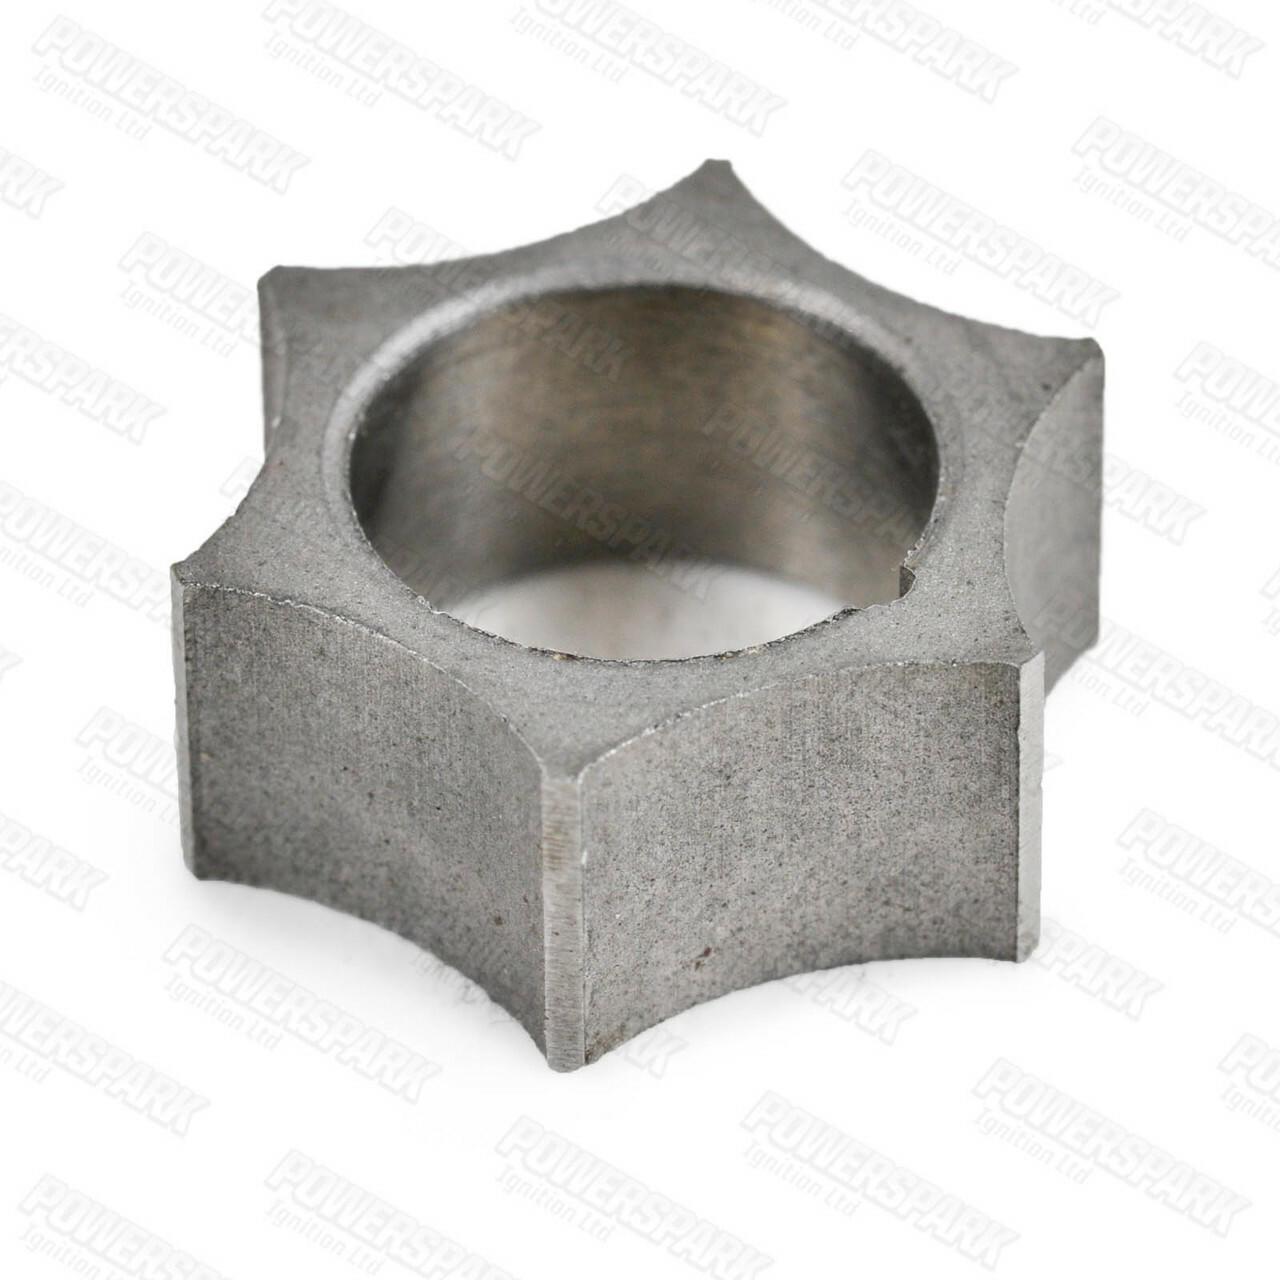 6 Cyl Steel Trigger Ring